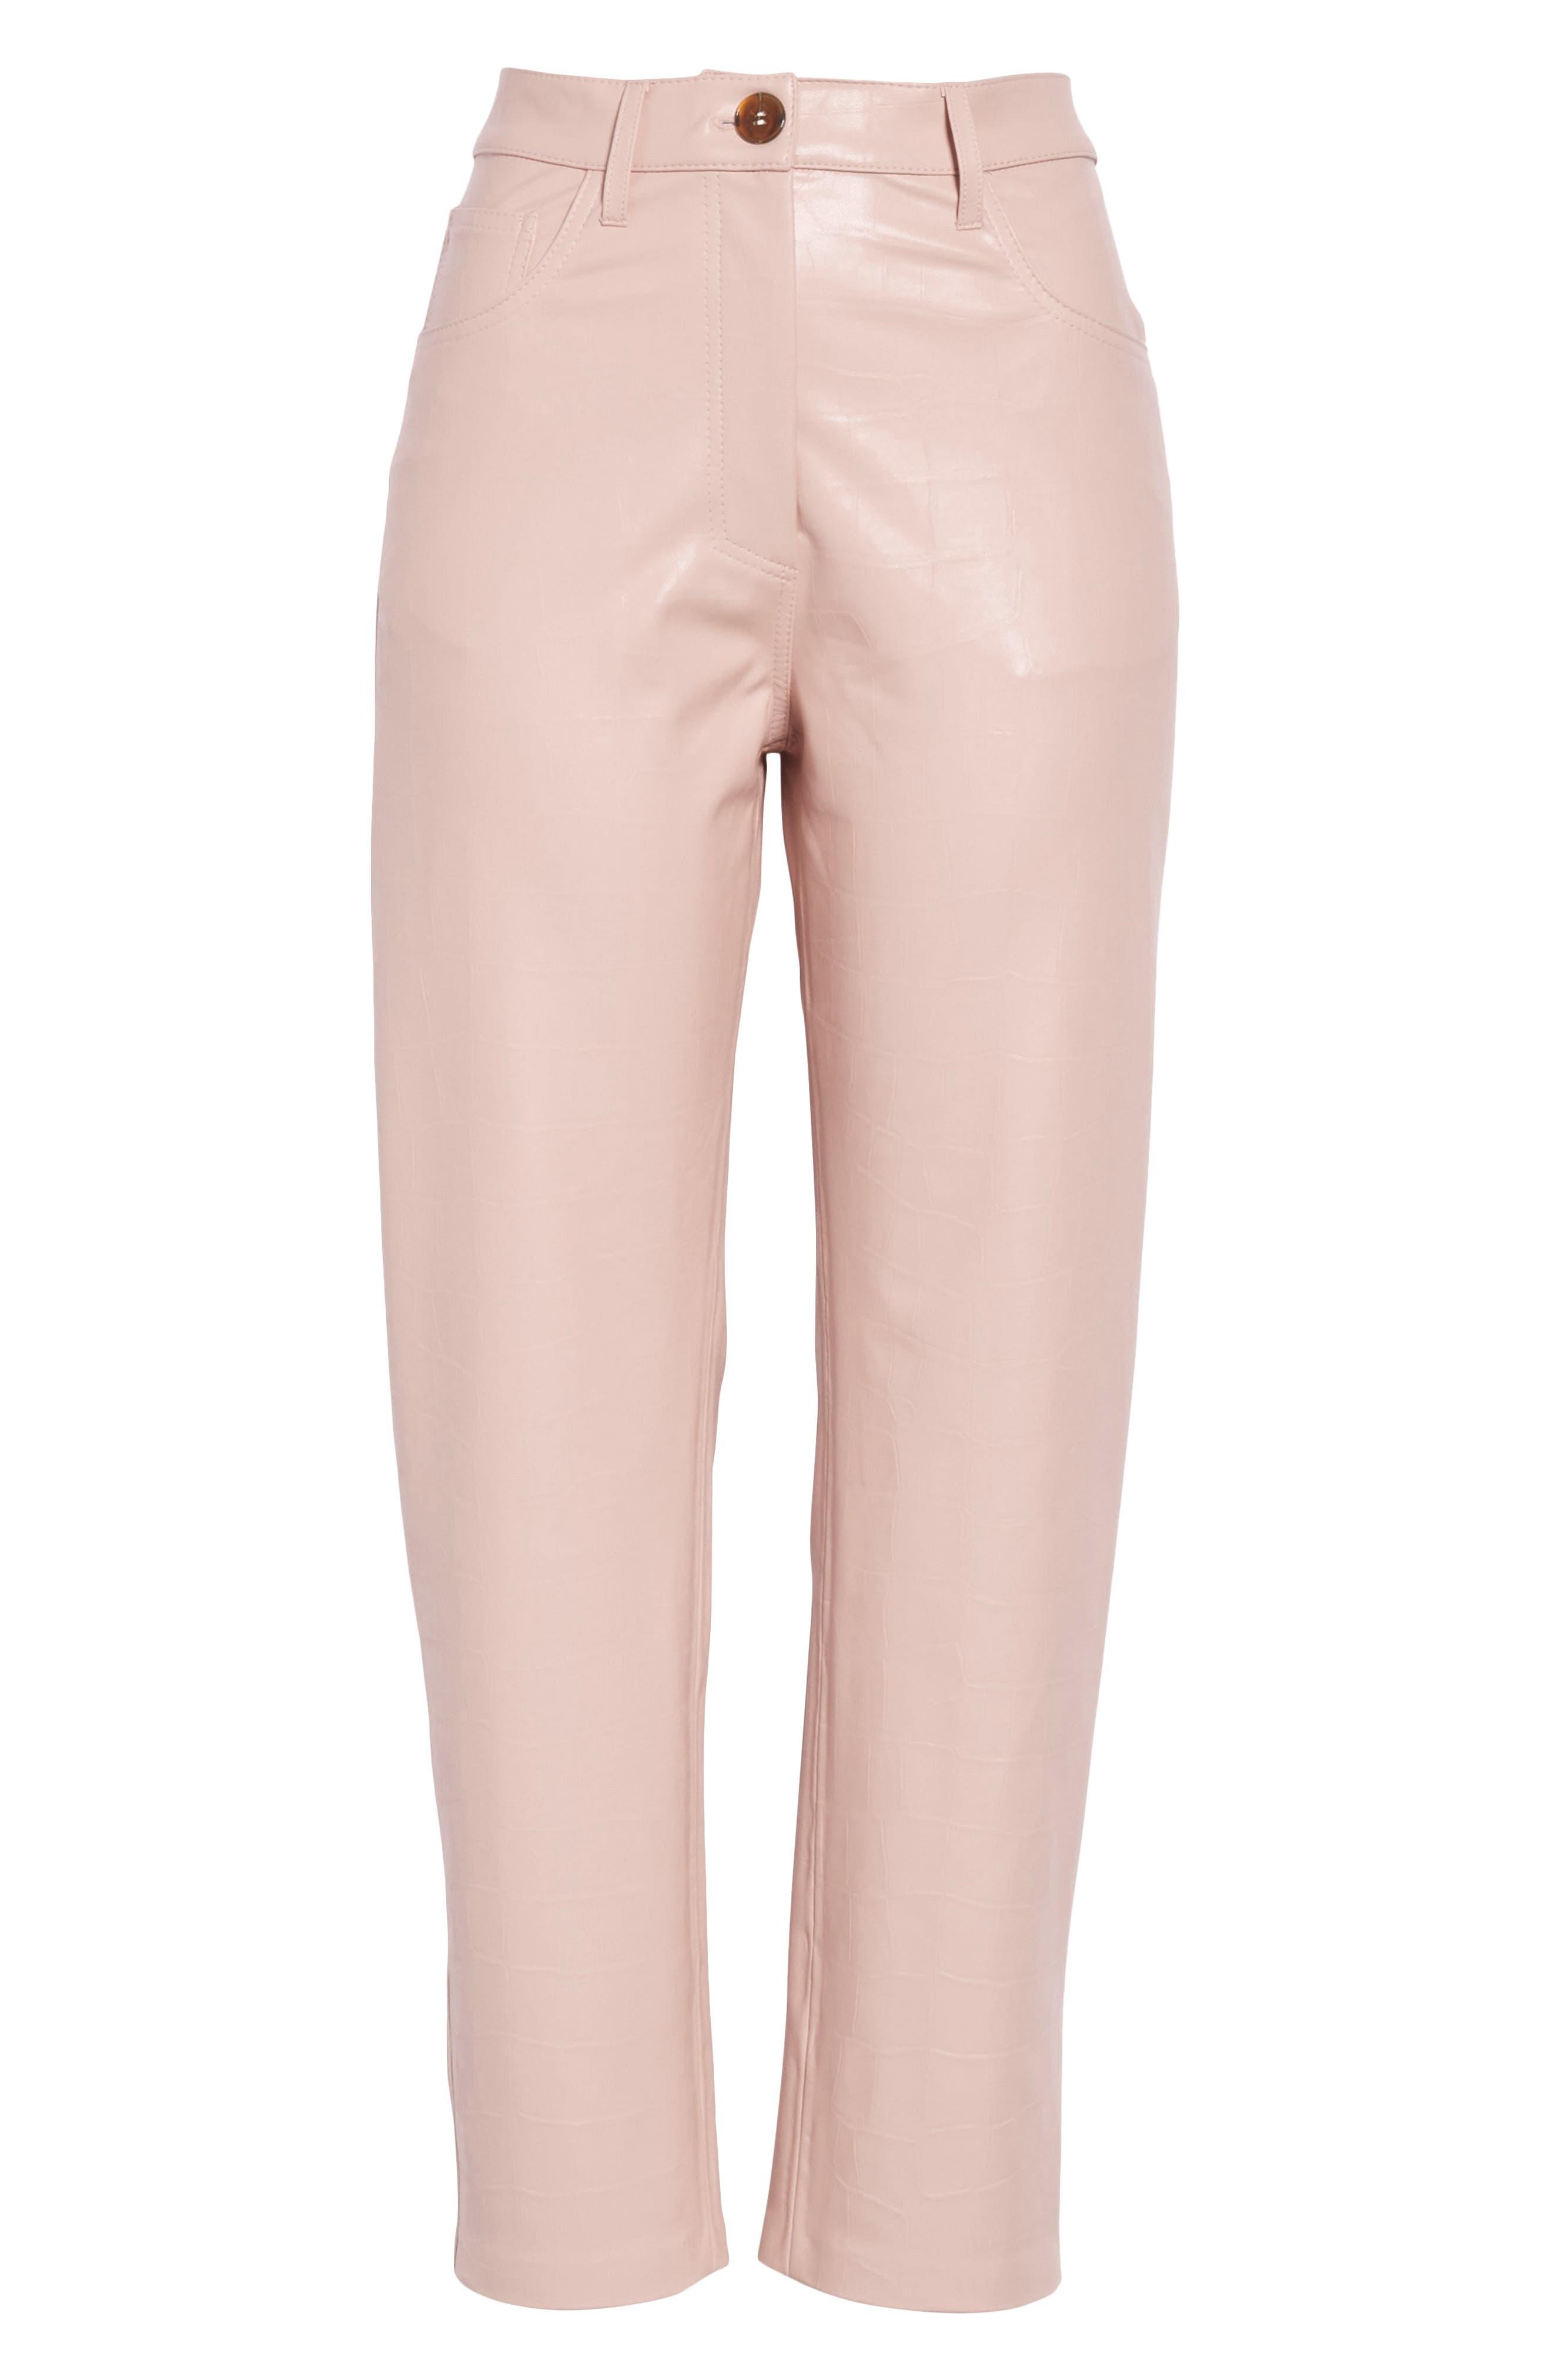 Ivy Faux Leather Straight Leg Pants,                             Alternate thumbnail 6, color,                             BLUSH